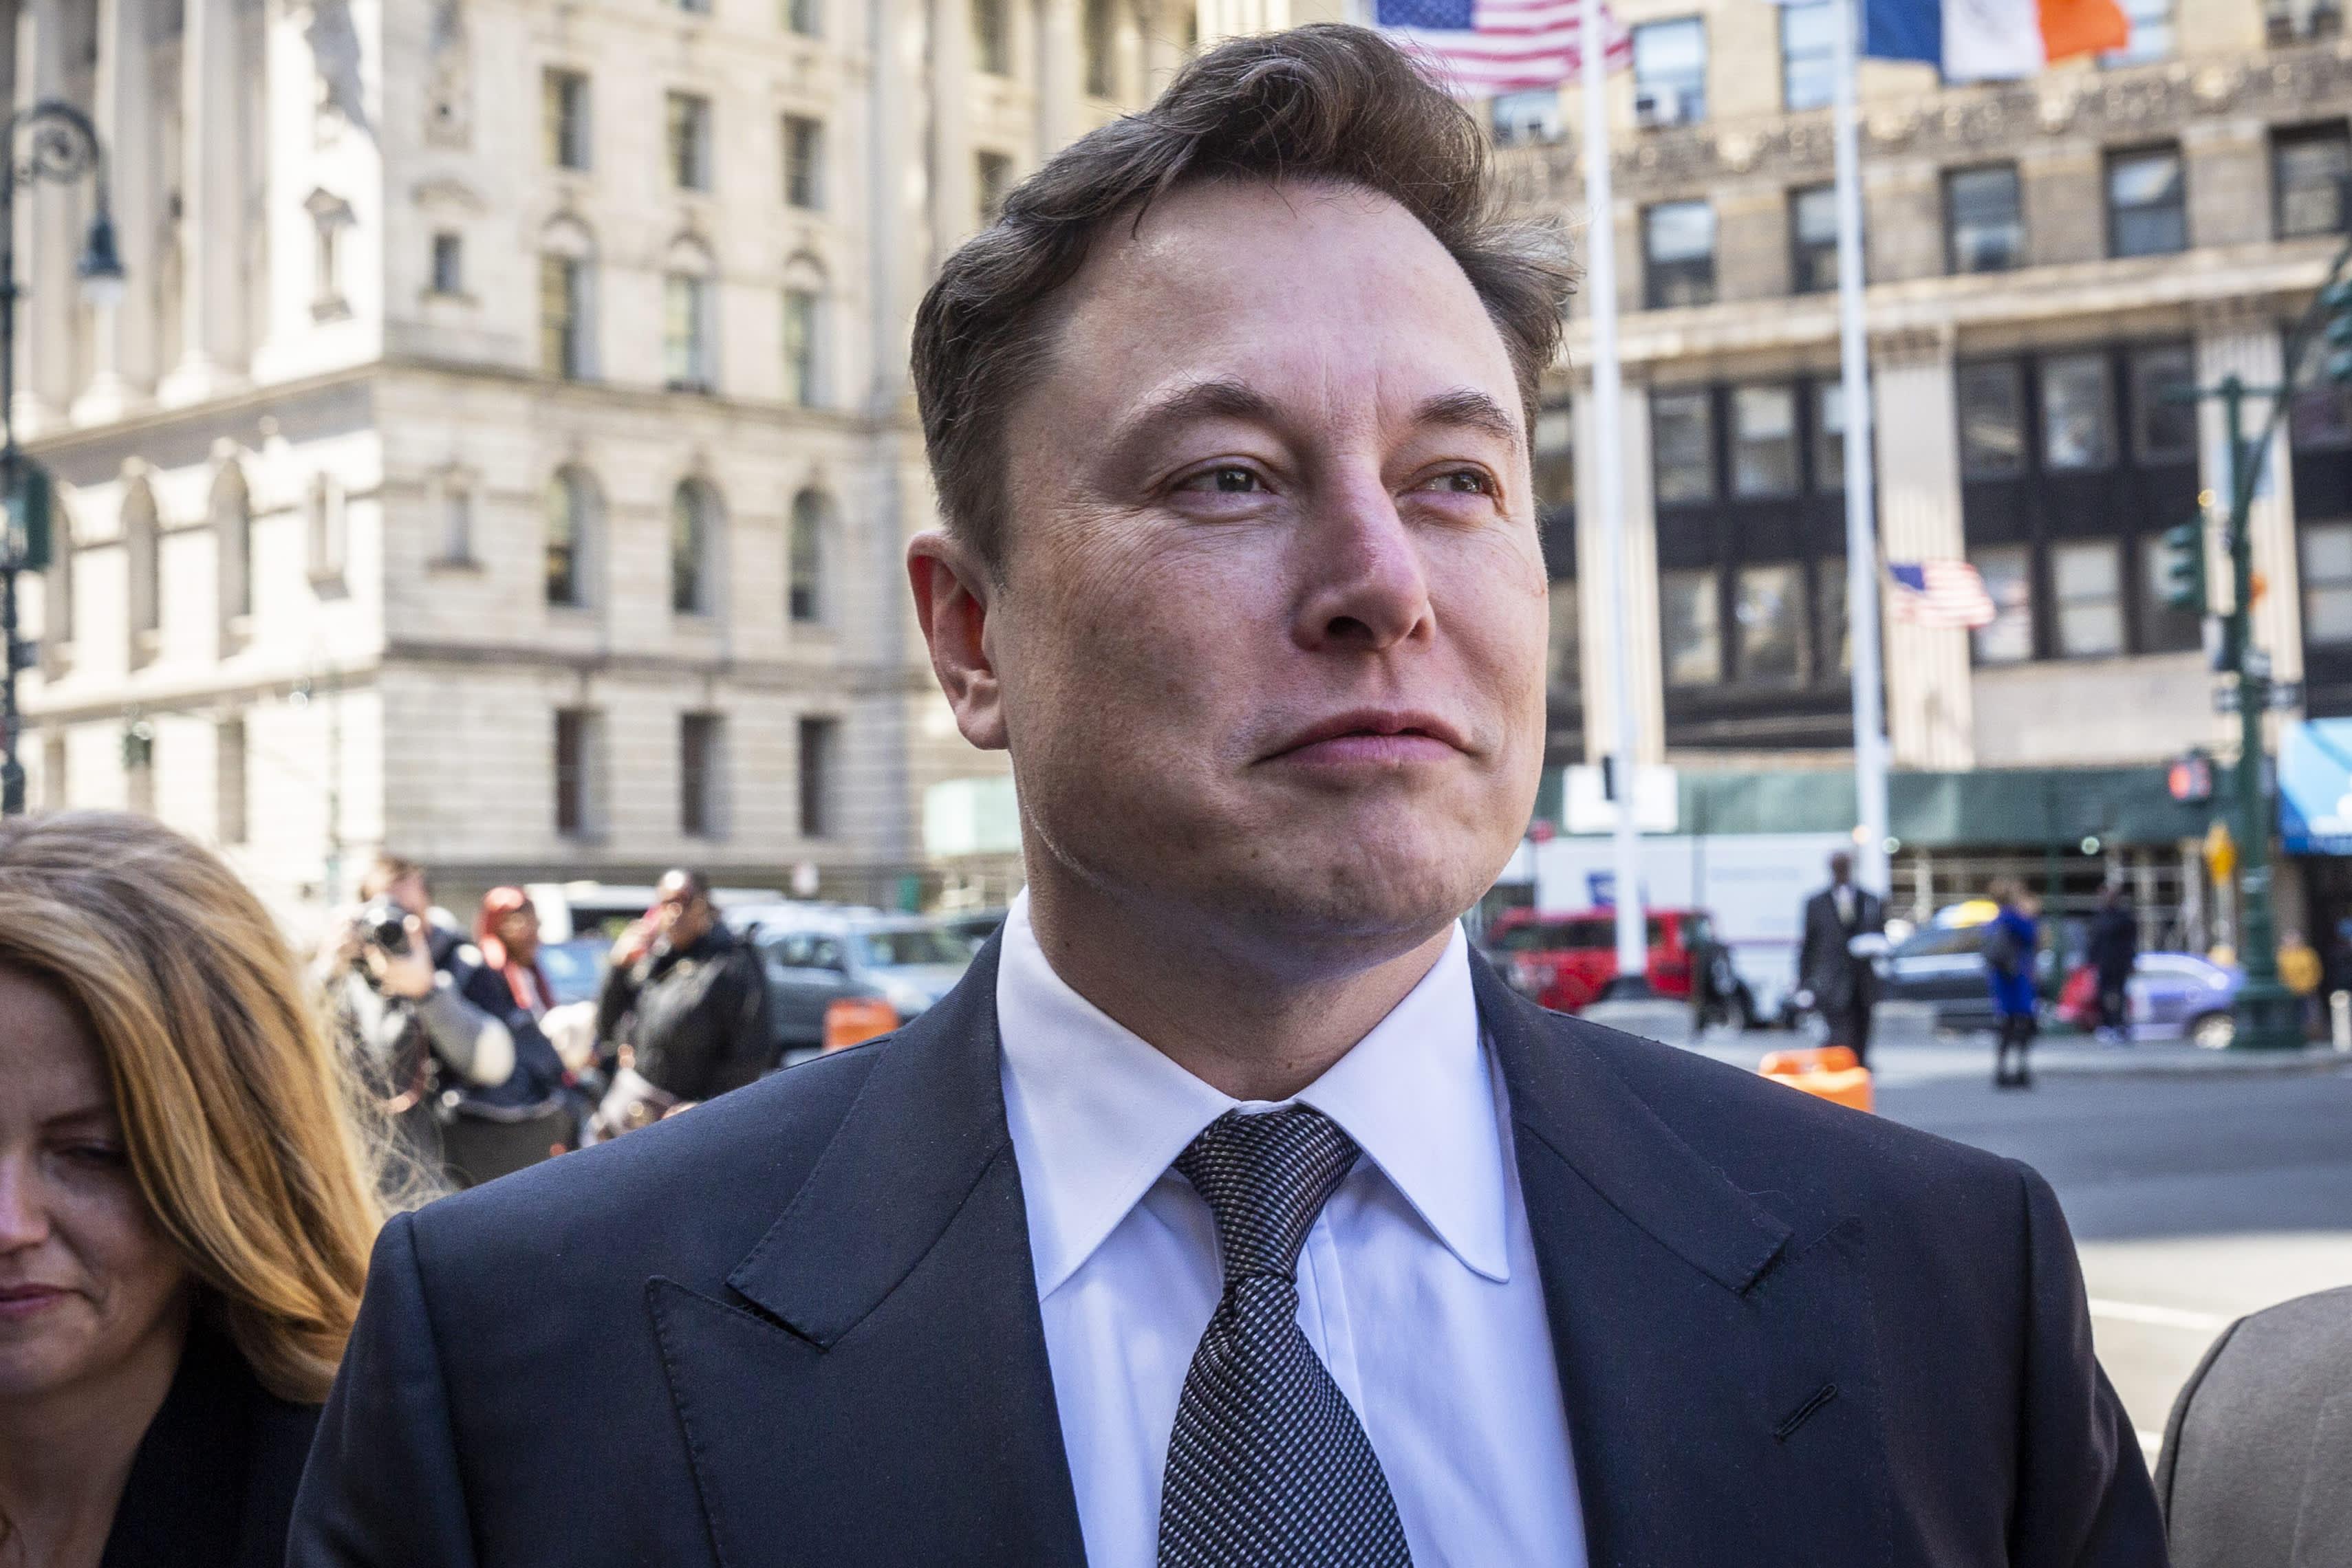 SEC, Tesla CEO Elon Musk seek one-week delay to resolve contempt motion